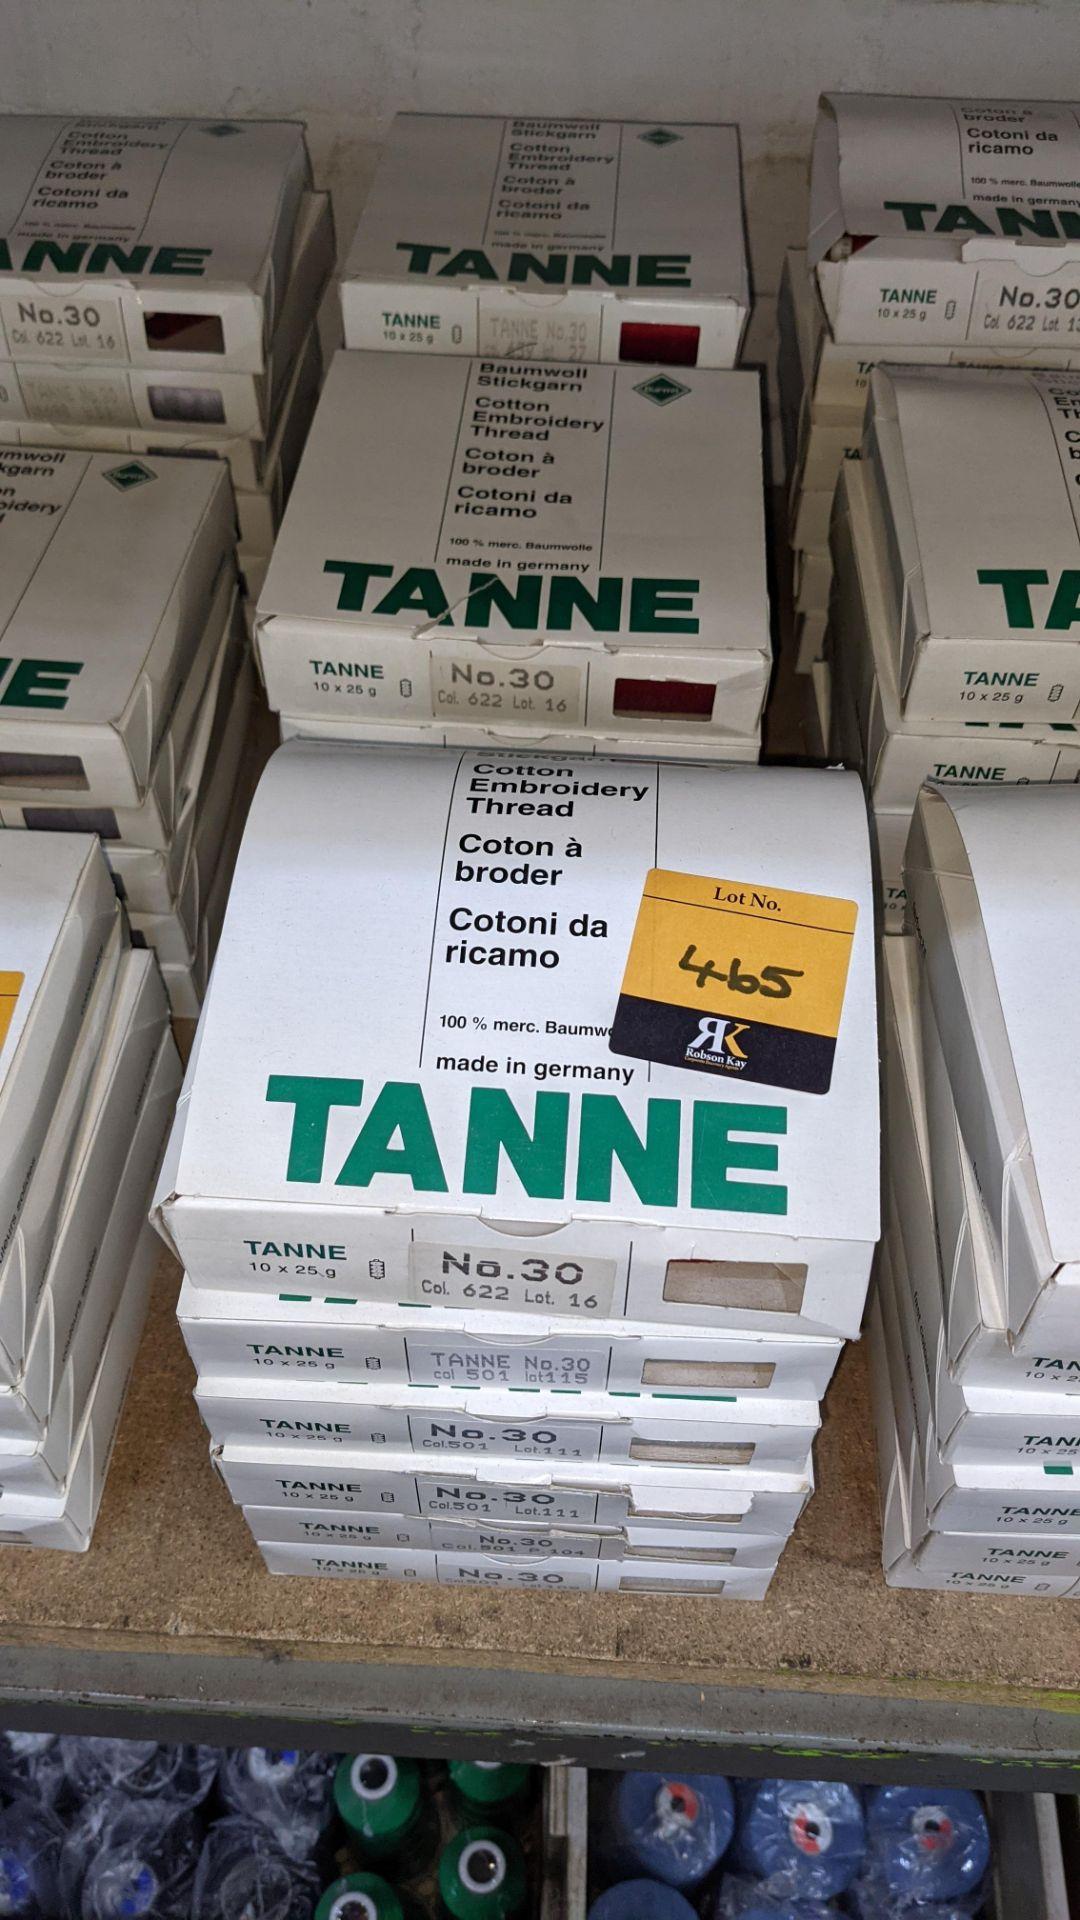 18 boxes of Madeira Tanne (Burmit) cotton embroidery thread